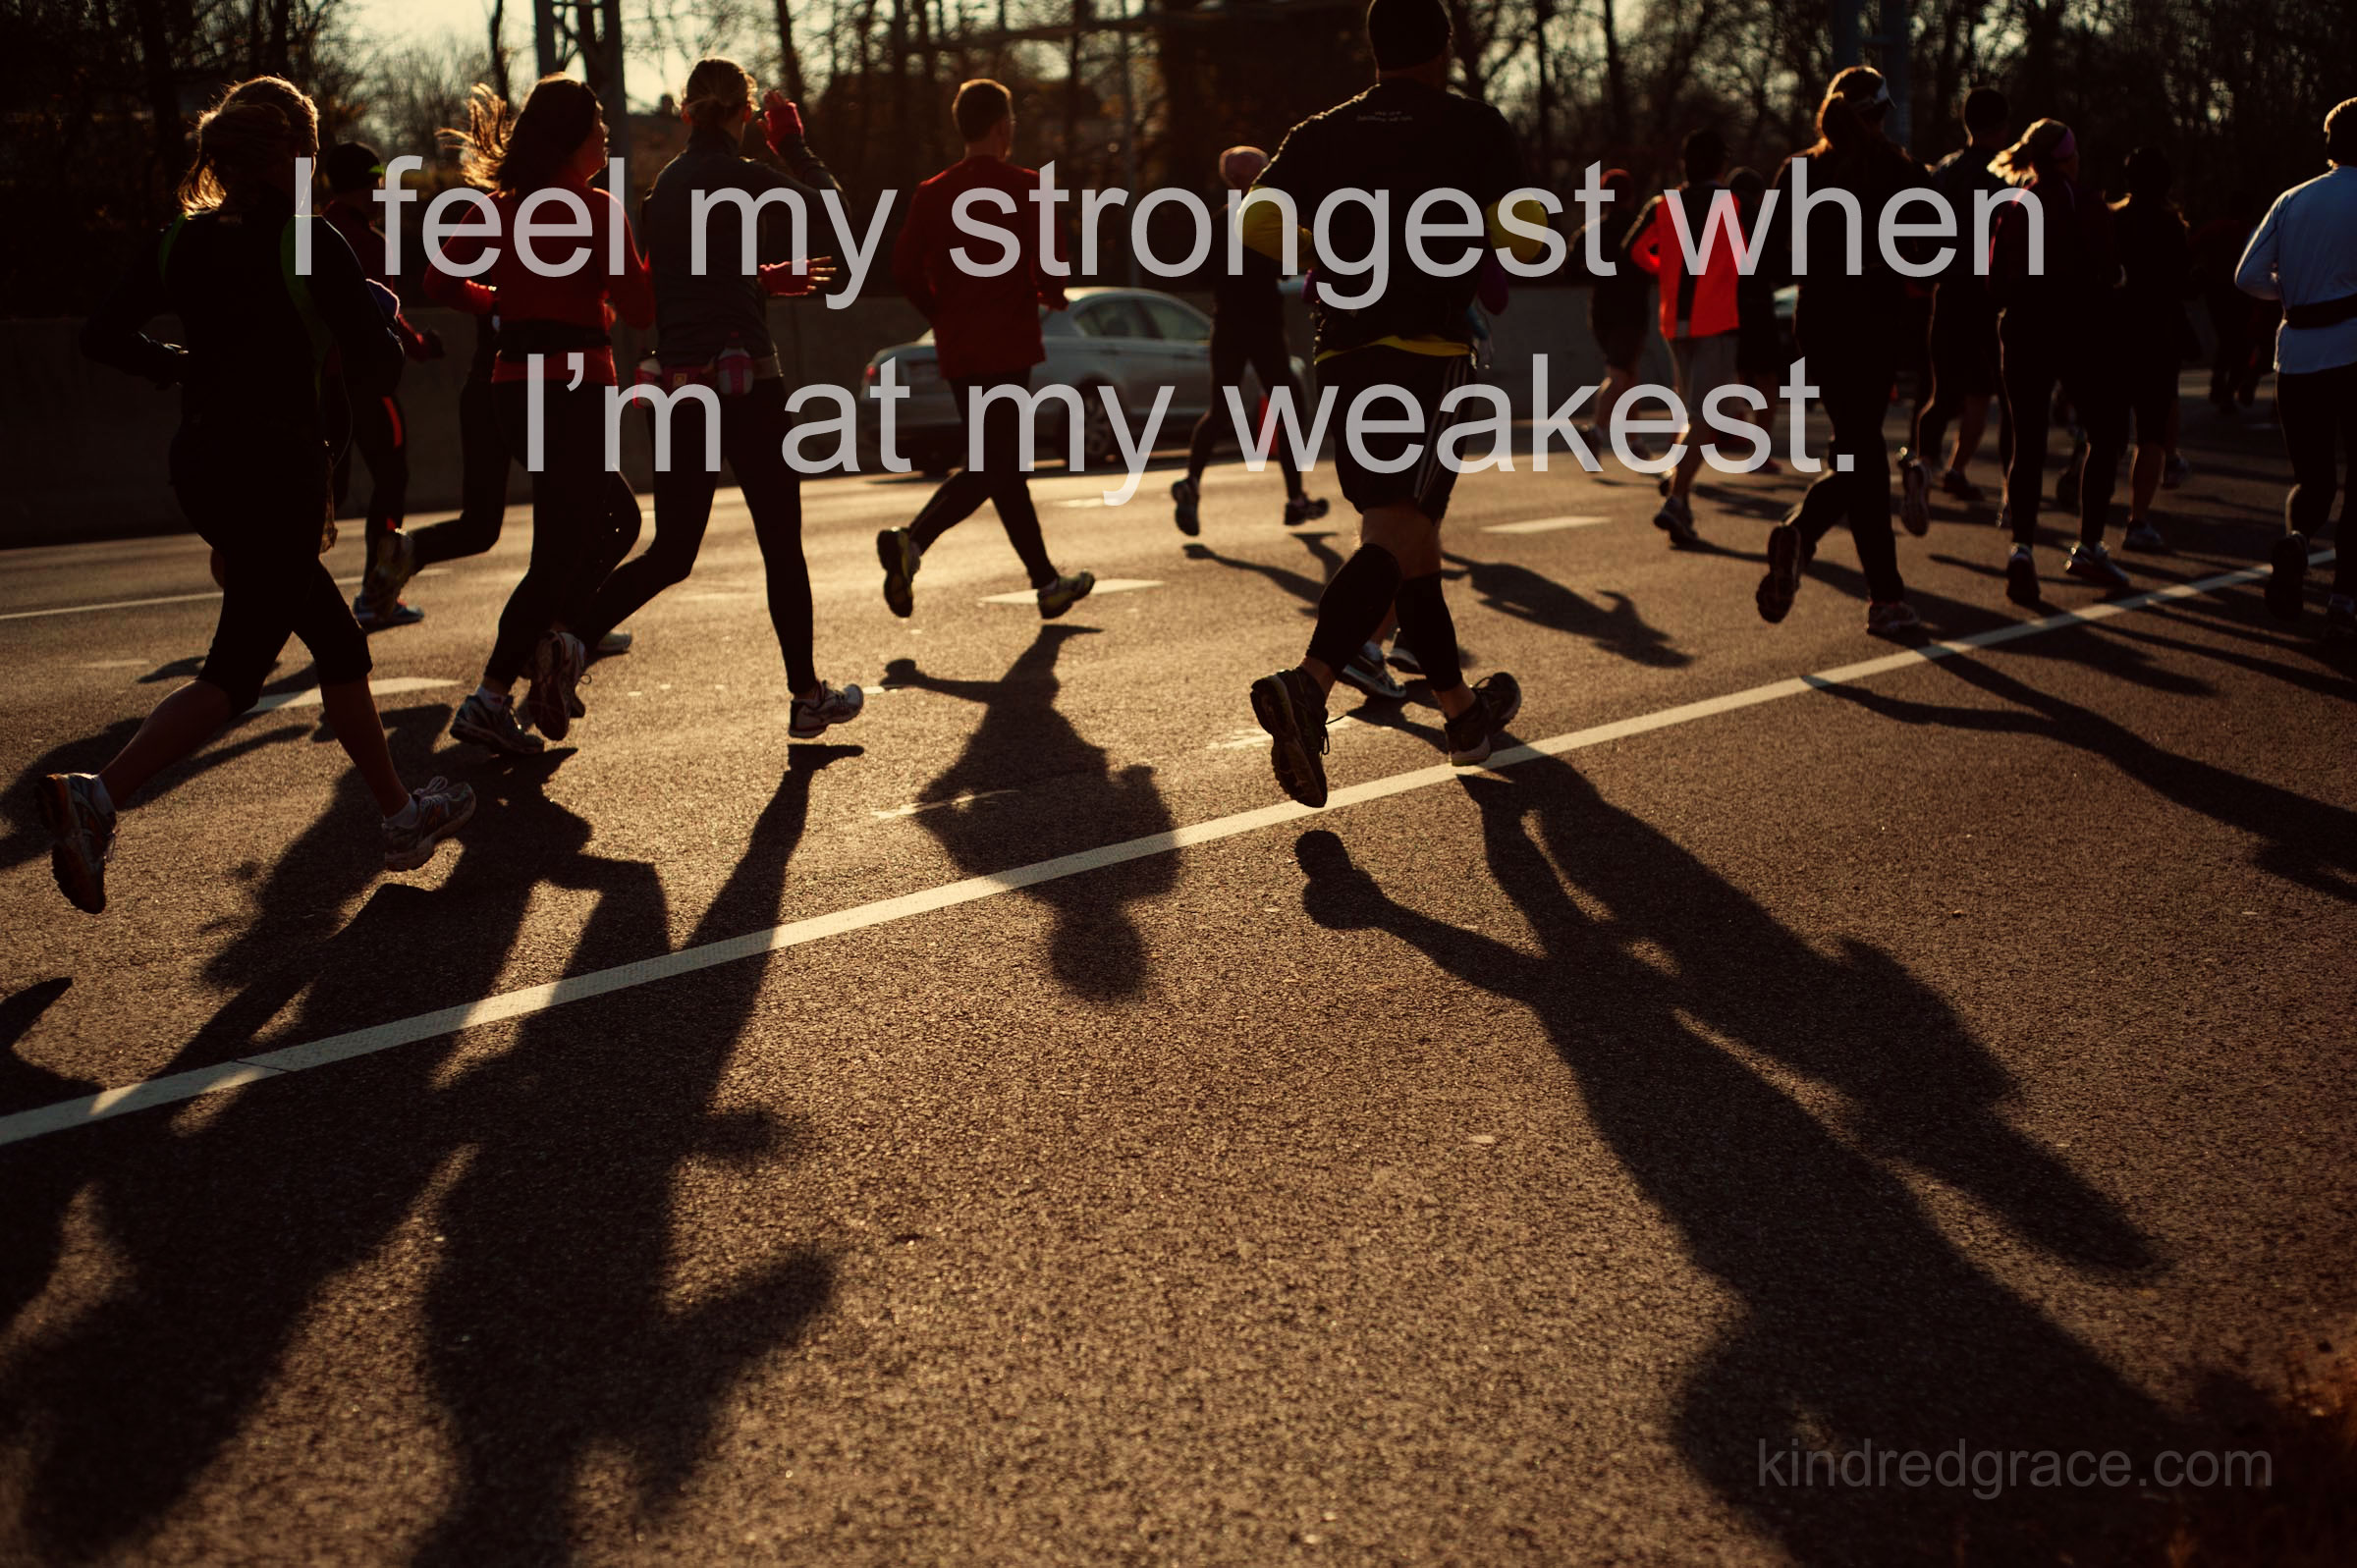 Strength: Body and Spirit